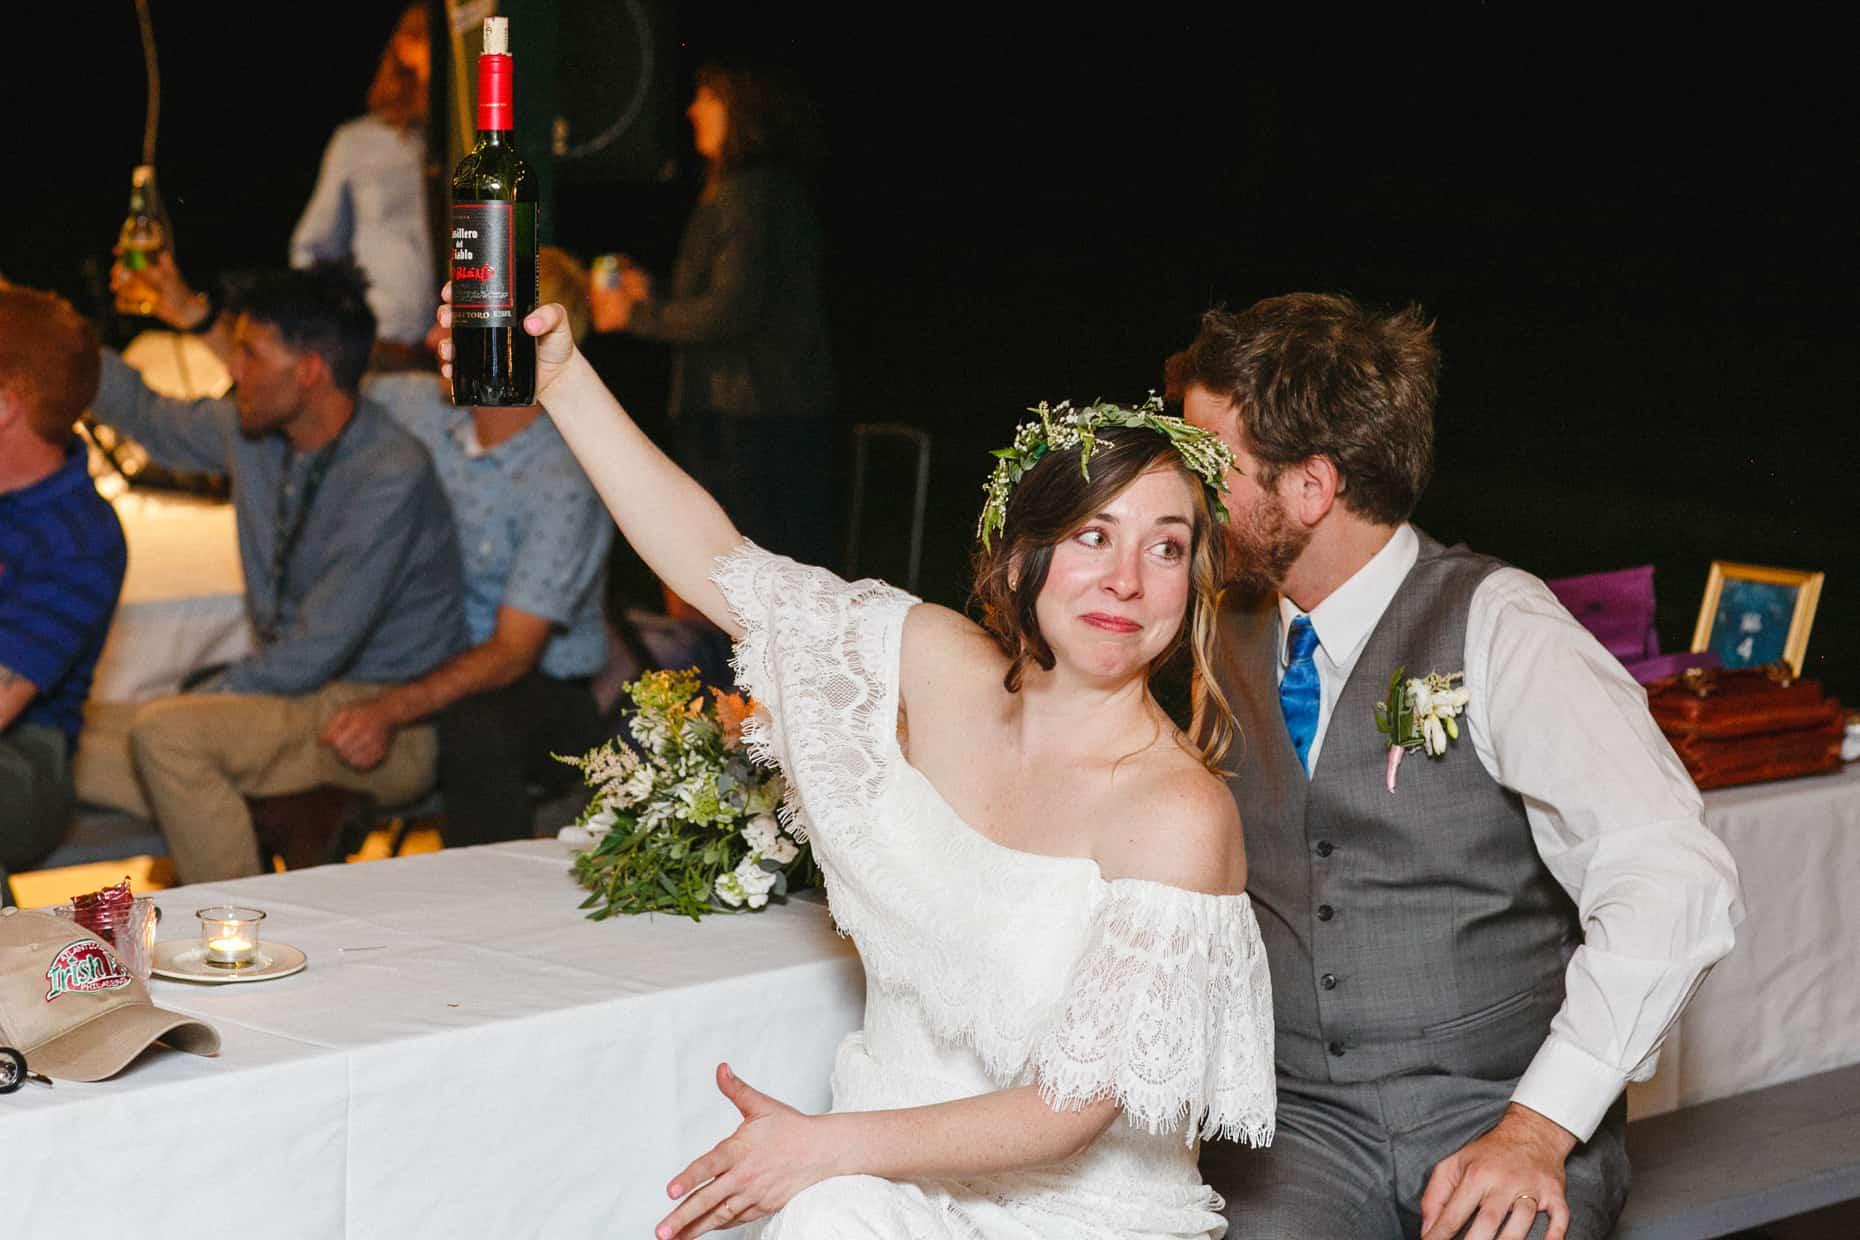 Phoenixville wedding receptions